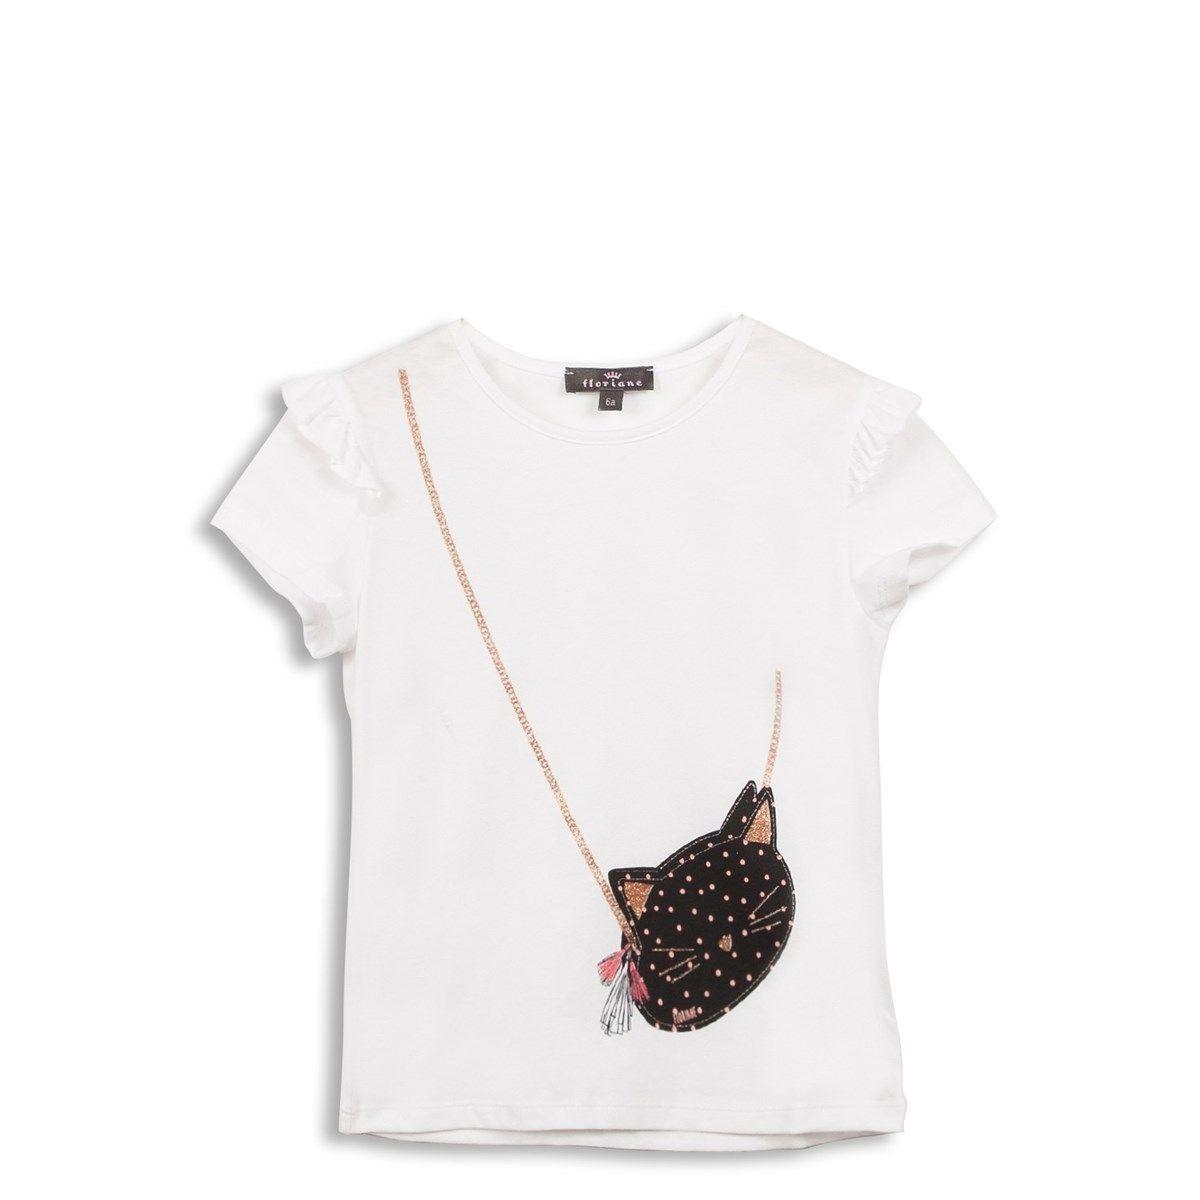 T-shirt avec sac imprimé